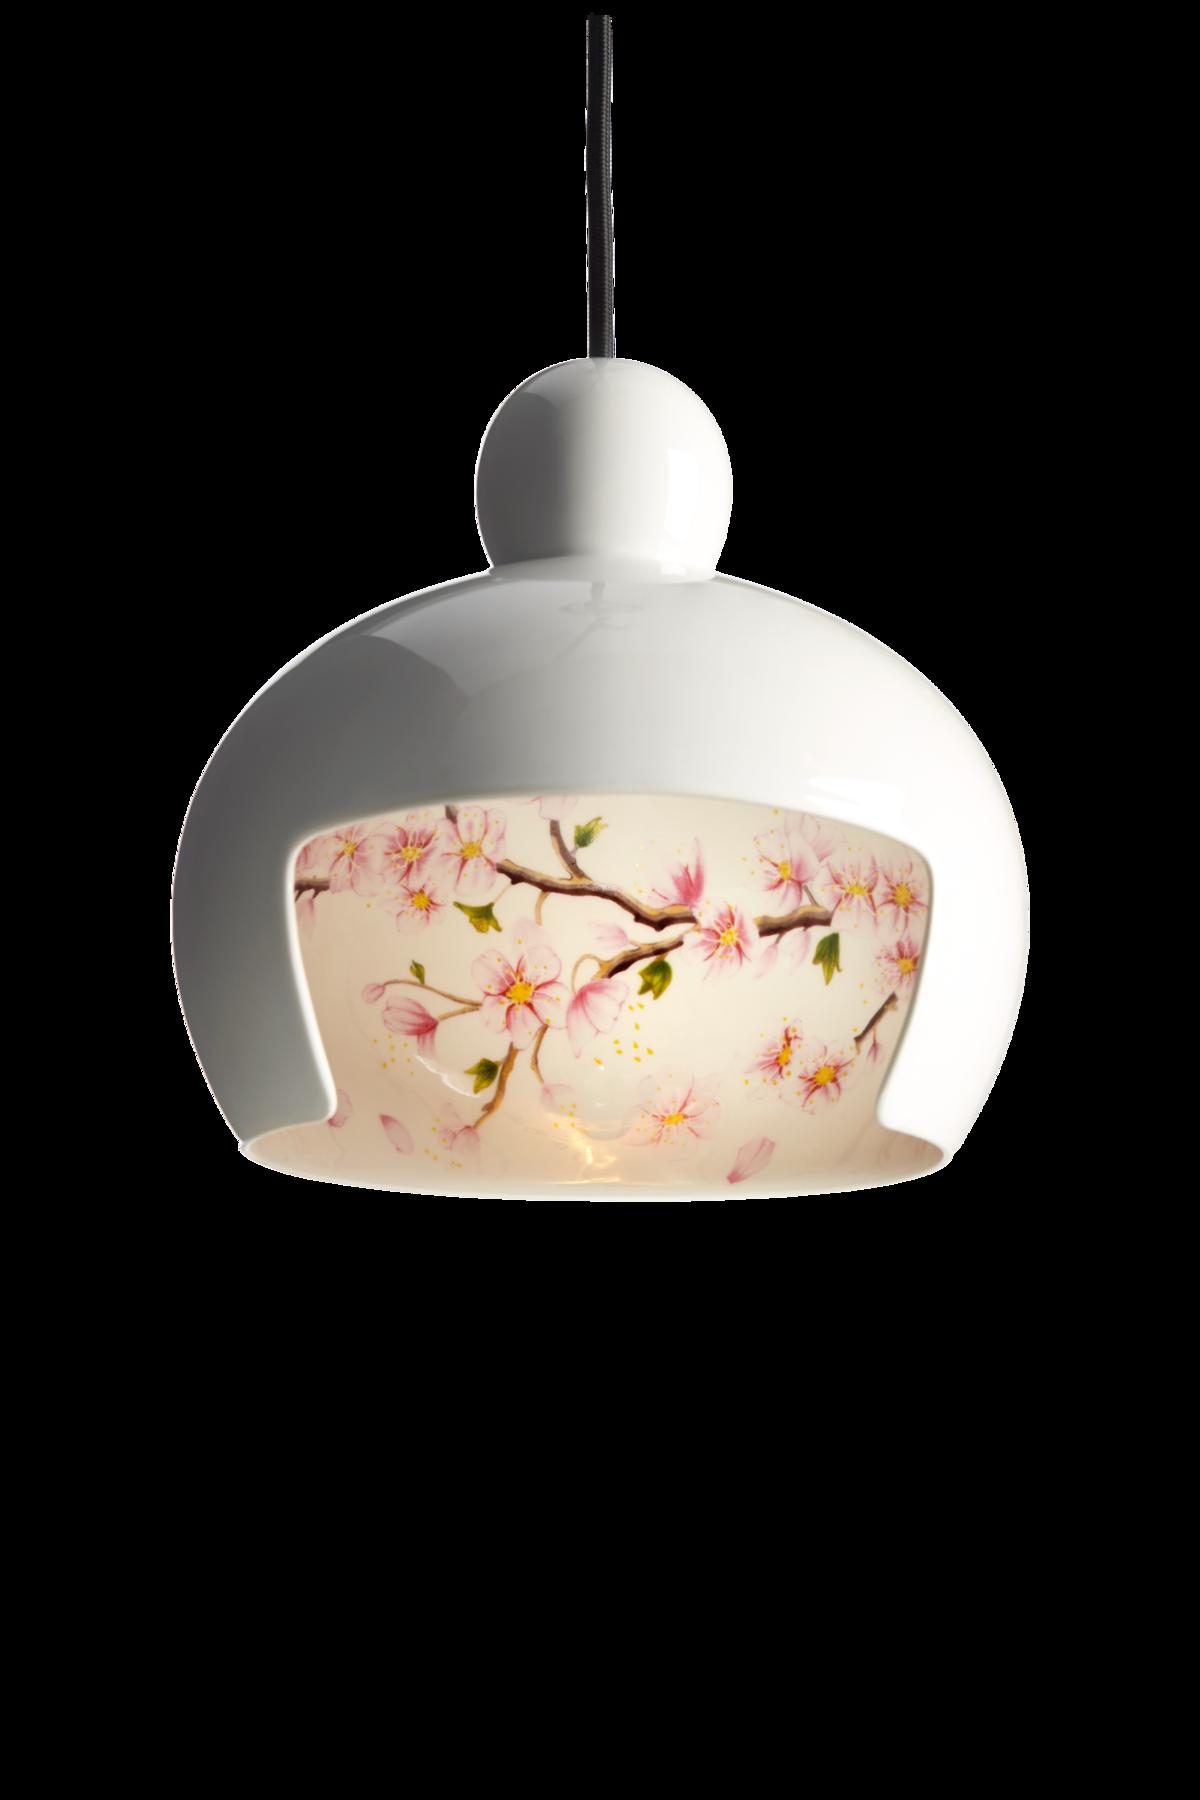 Juuyo suspension light Peach Flowers front view